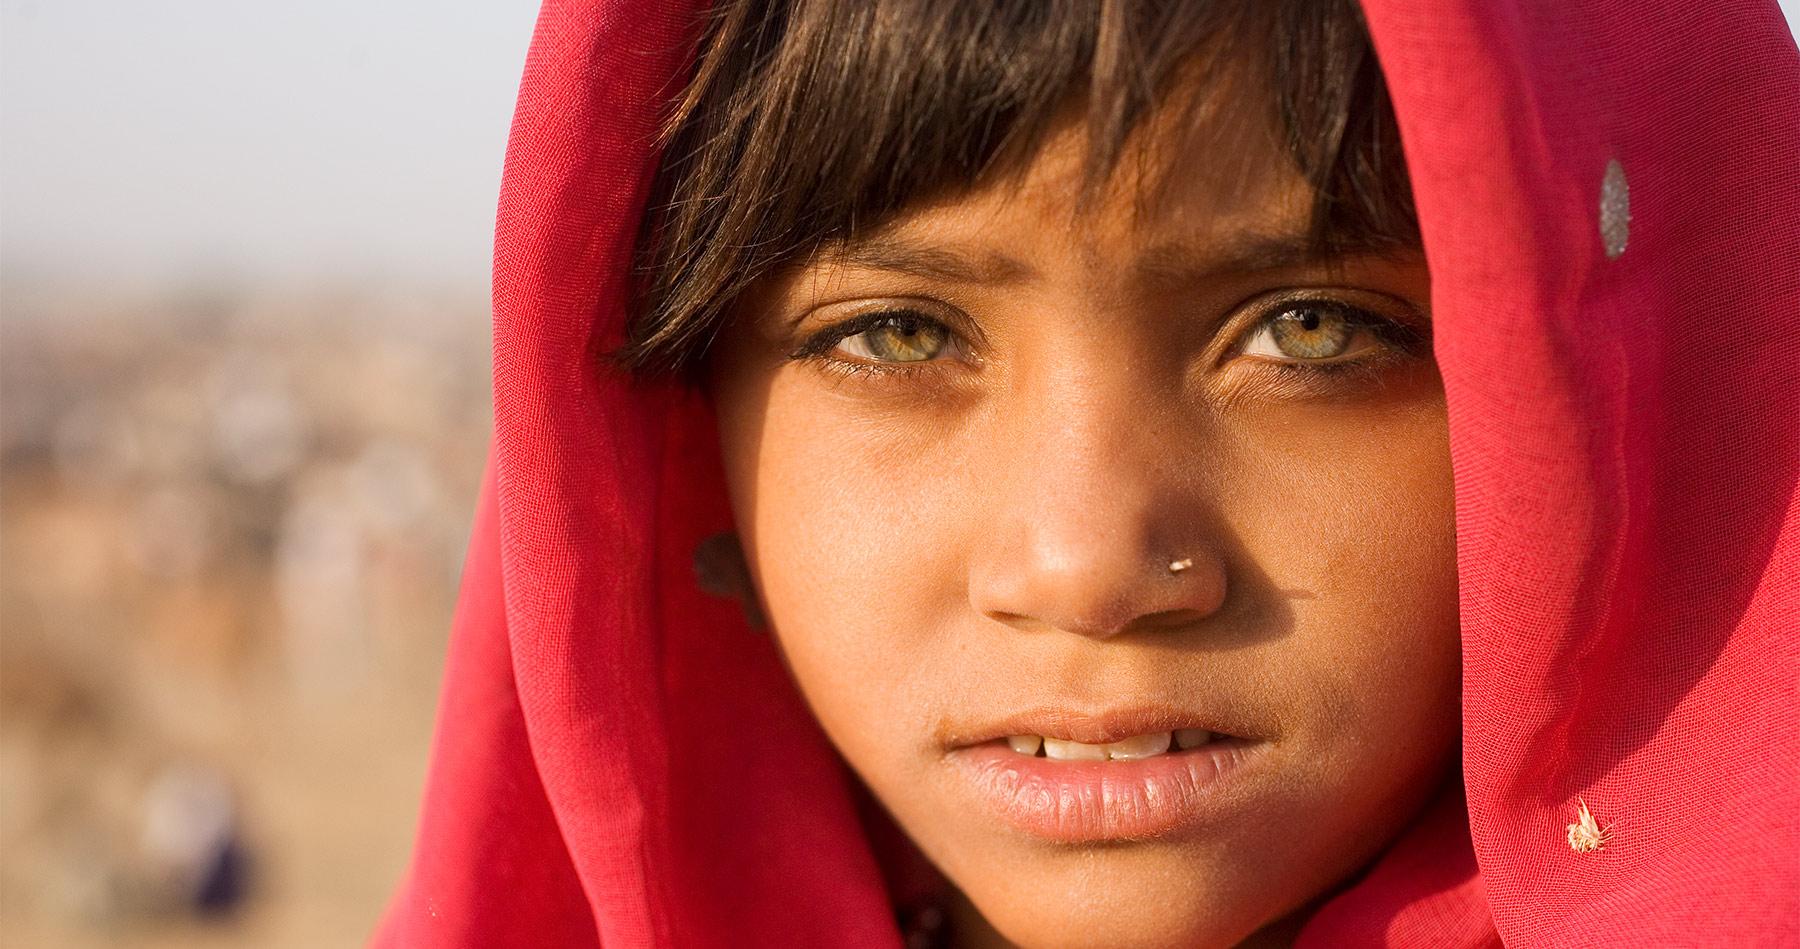 india_portrait_red_girl_intro